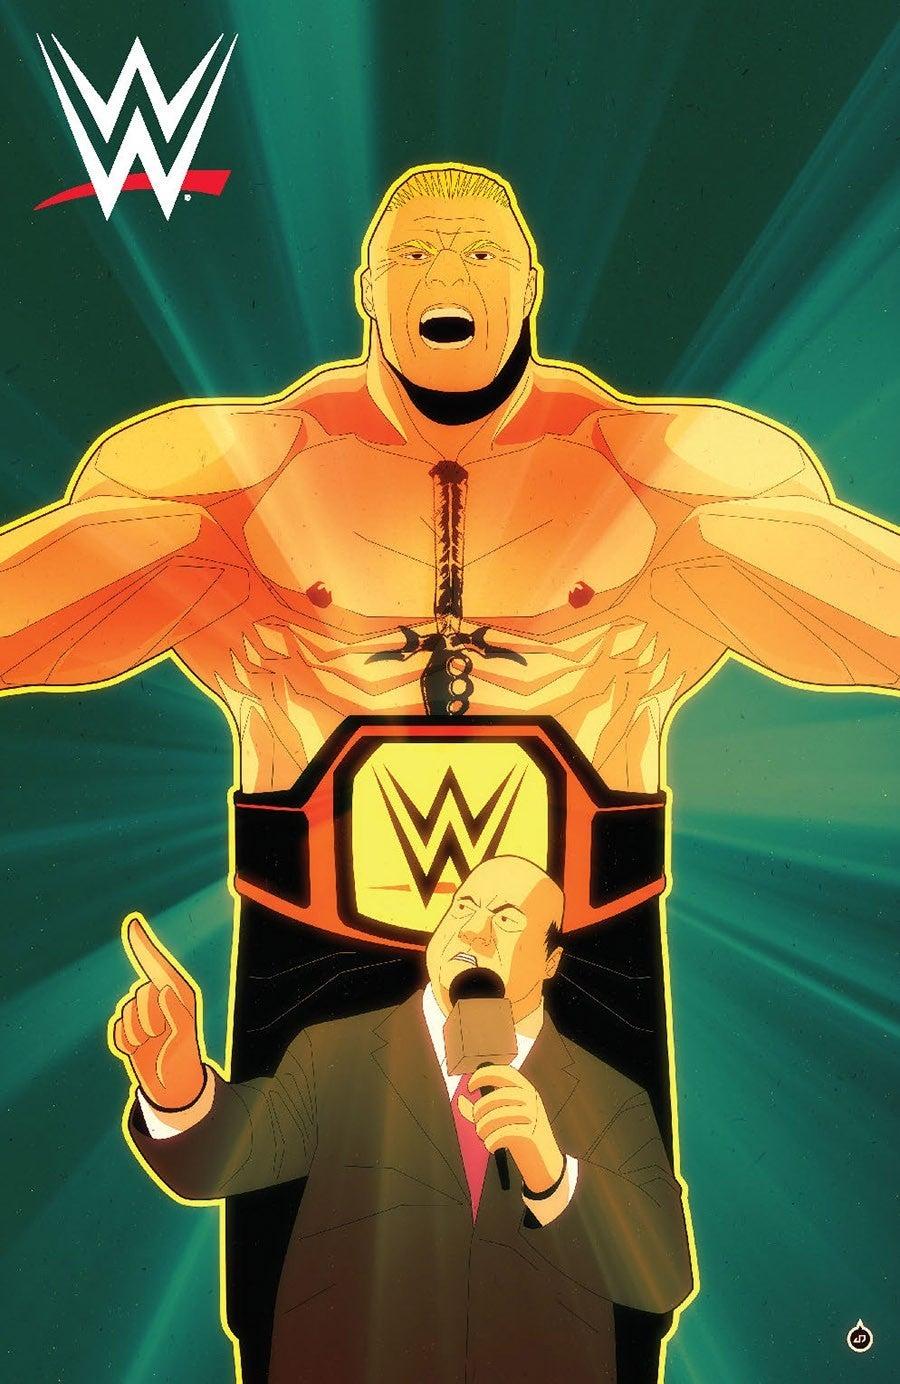 WWE_RoyalRumble_2018_B_Variant